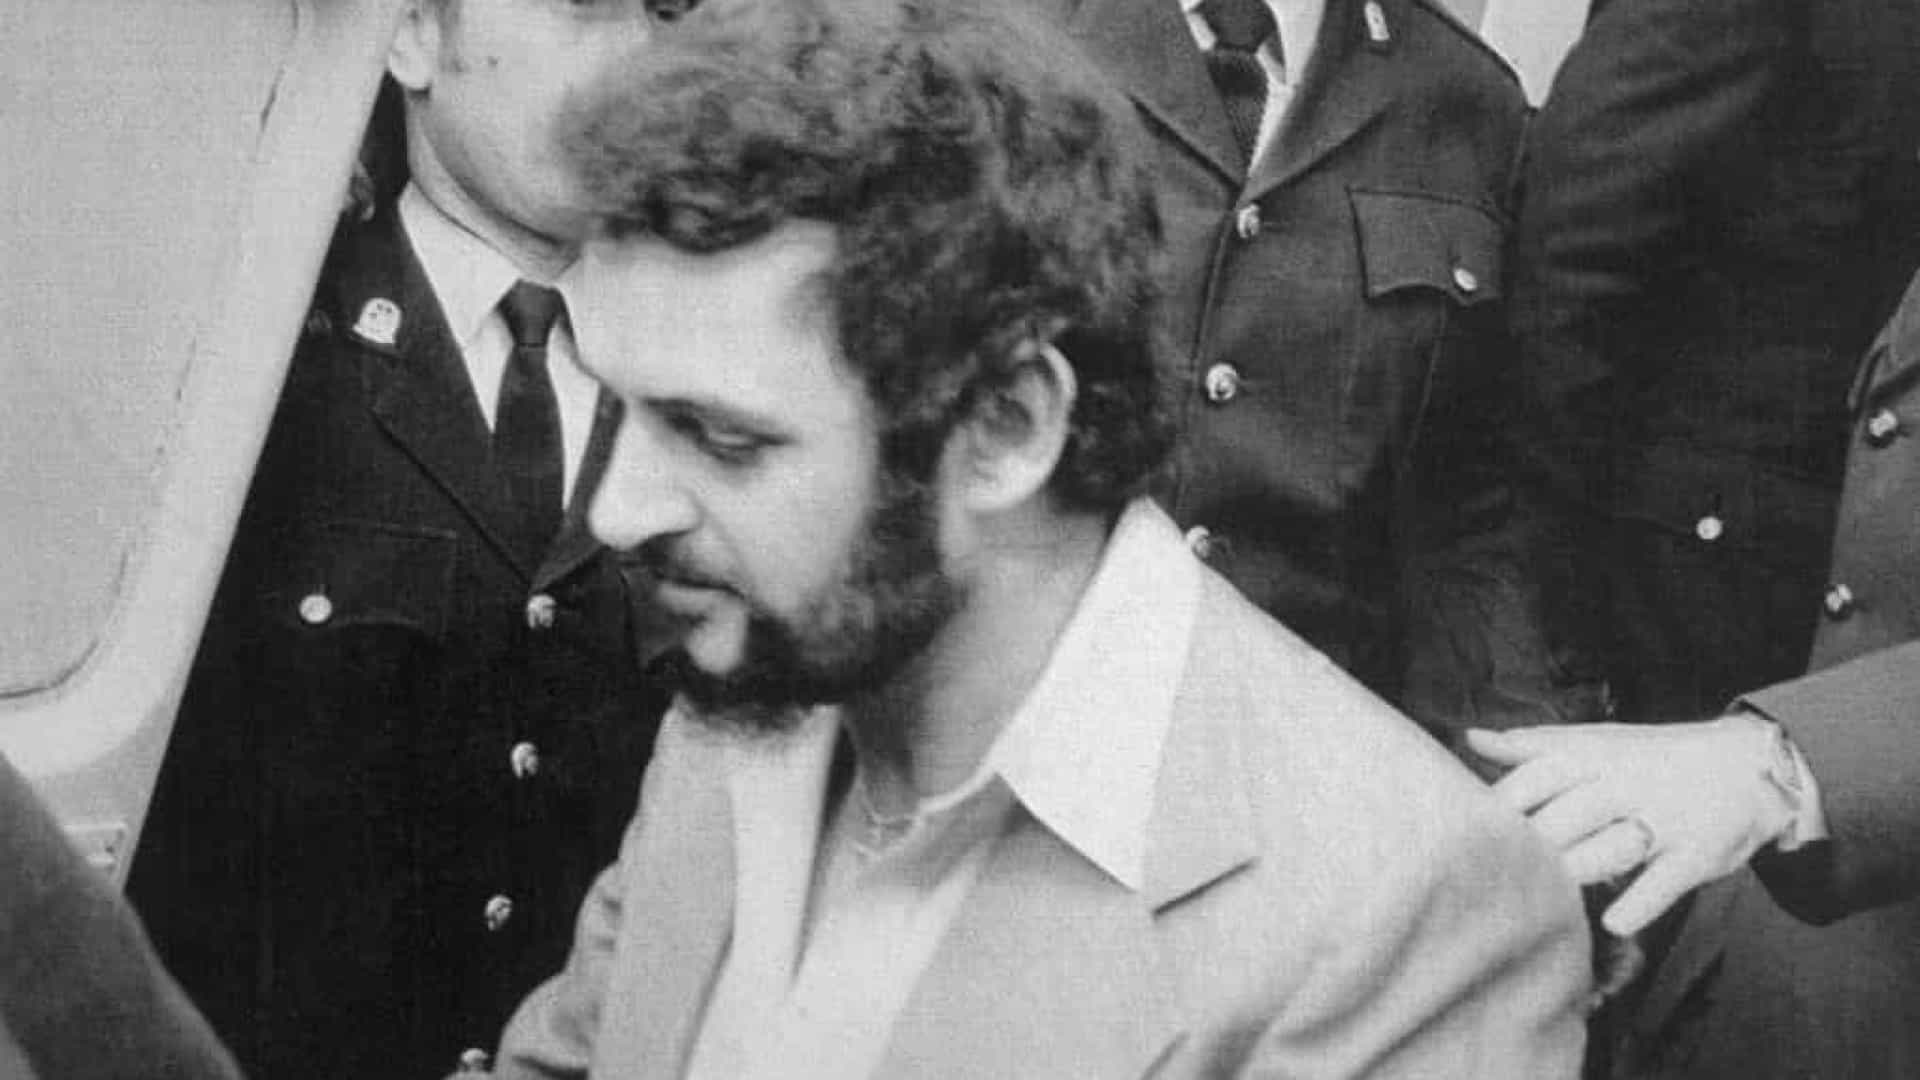 Estripador de Yorkshire, que matou 13 mulheres, morre de Covid-19